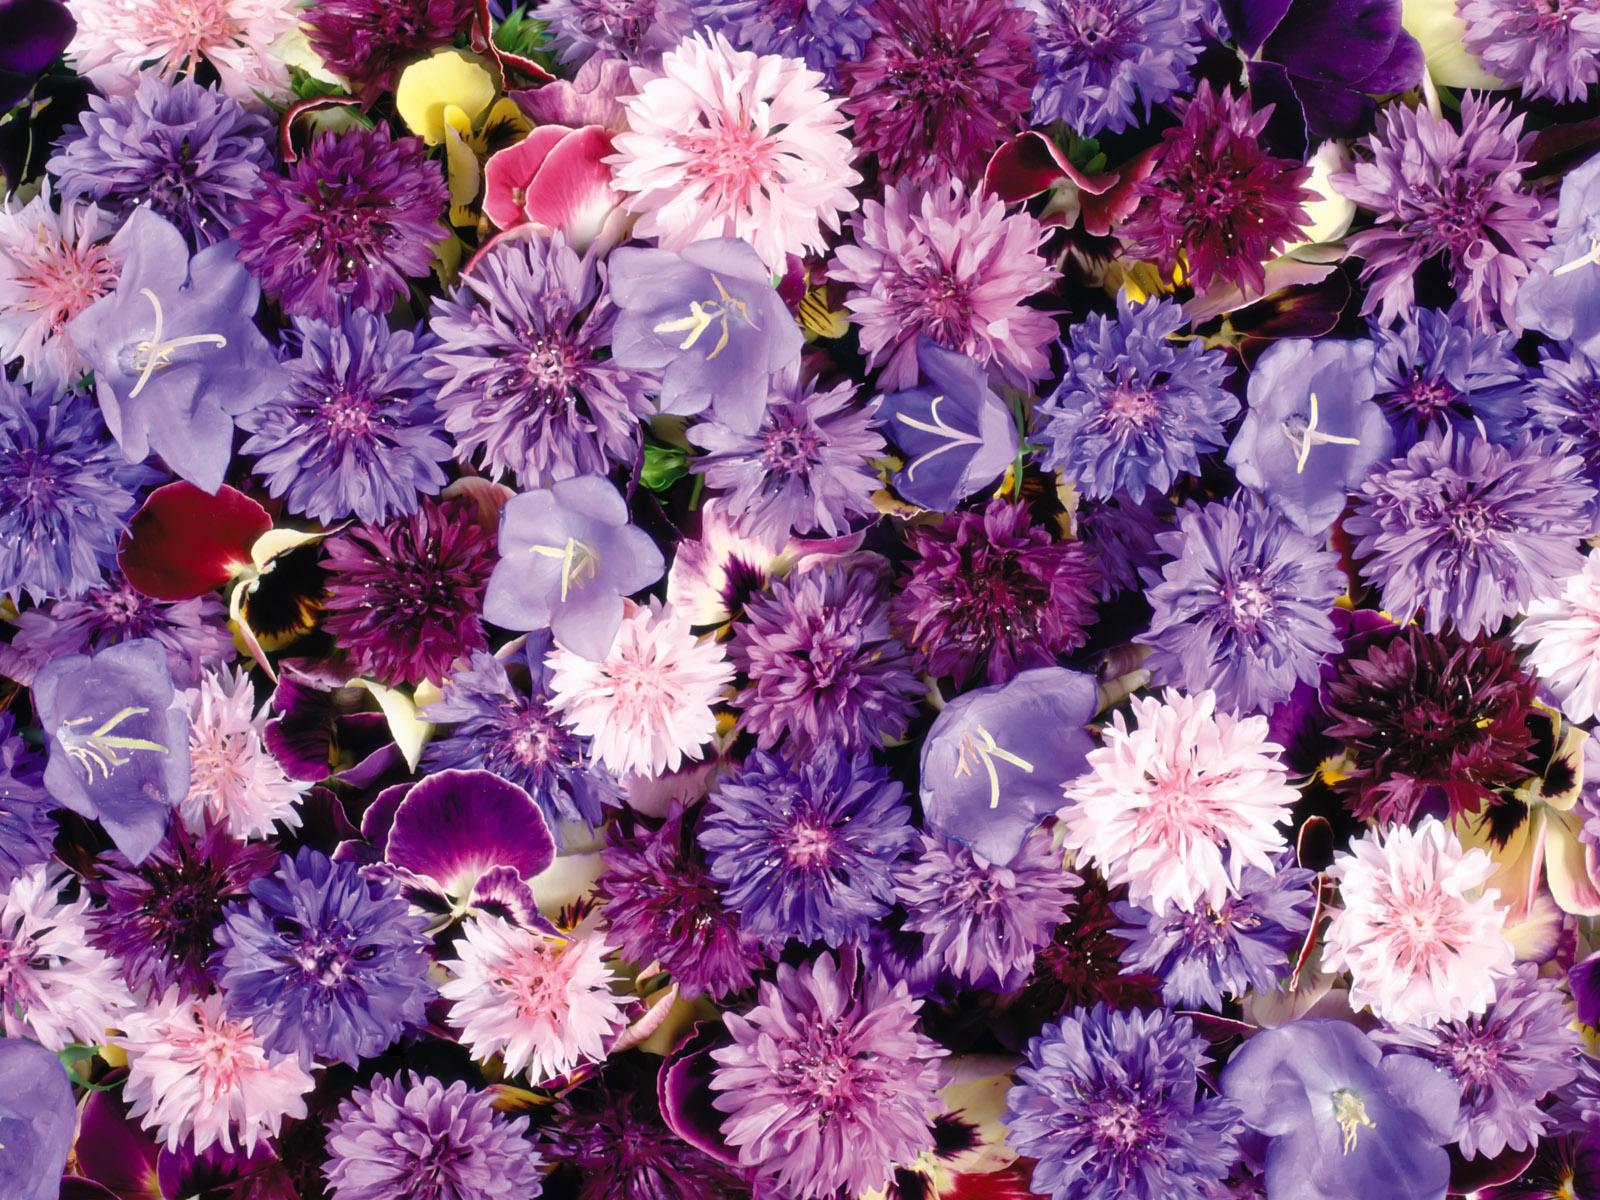 Amazing Colorful Flowers Decoration Photos 1600x1200 Pixhome